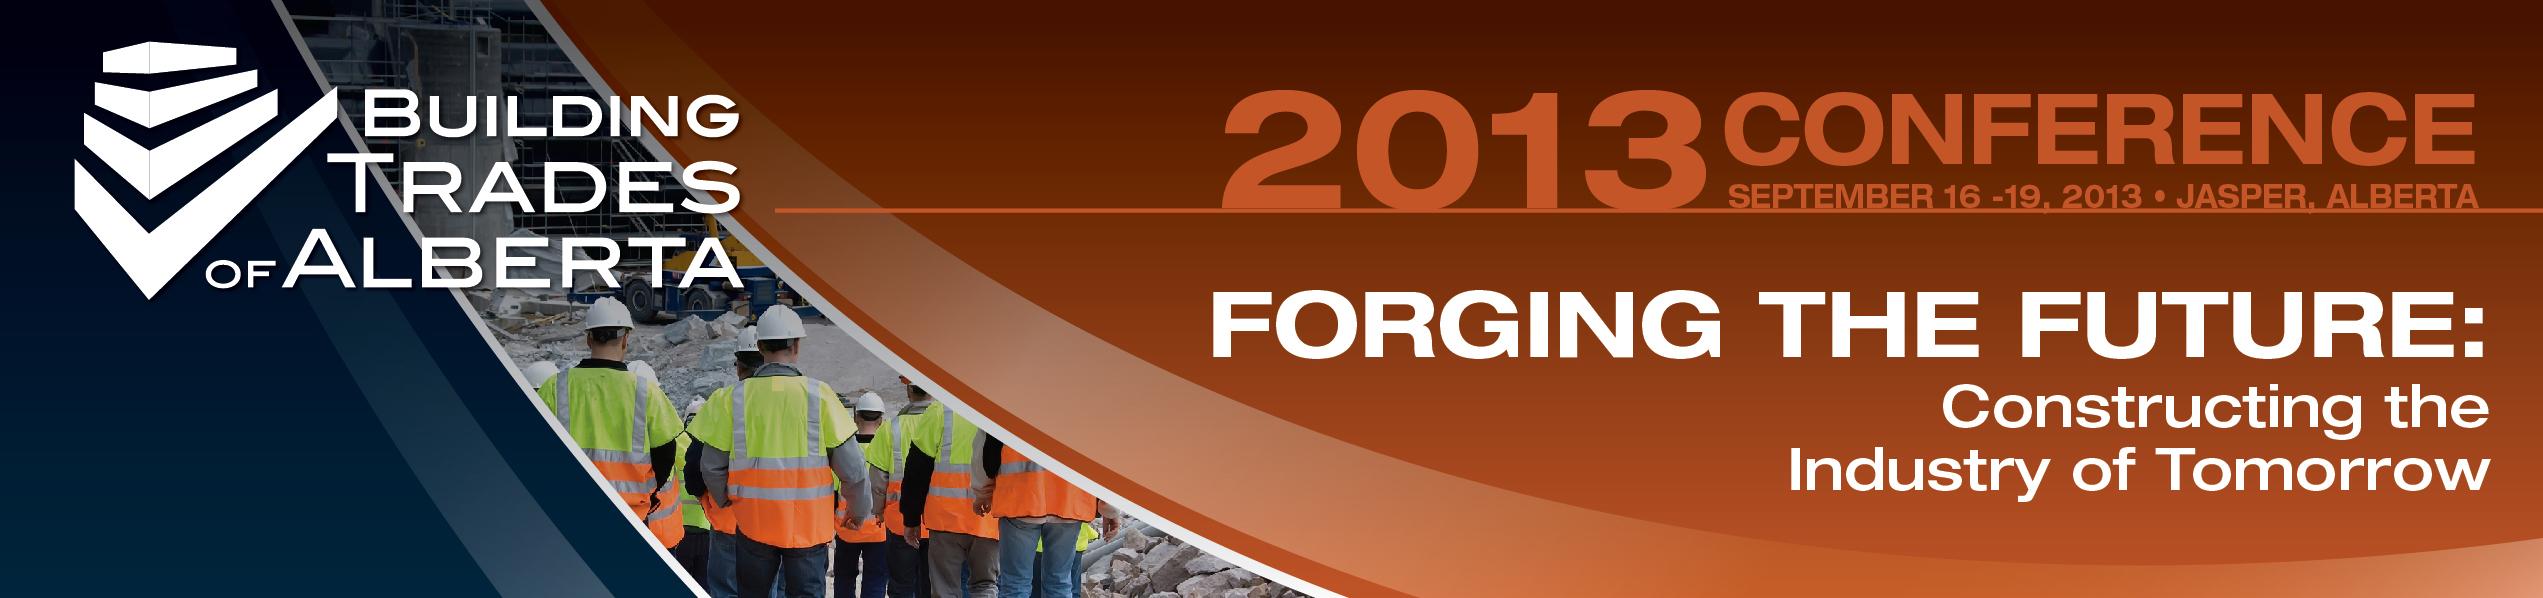 Building Trades of Alberta 2013 Conference